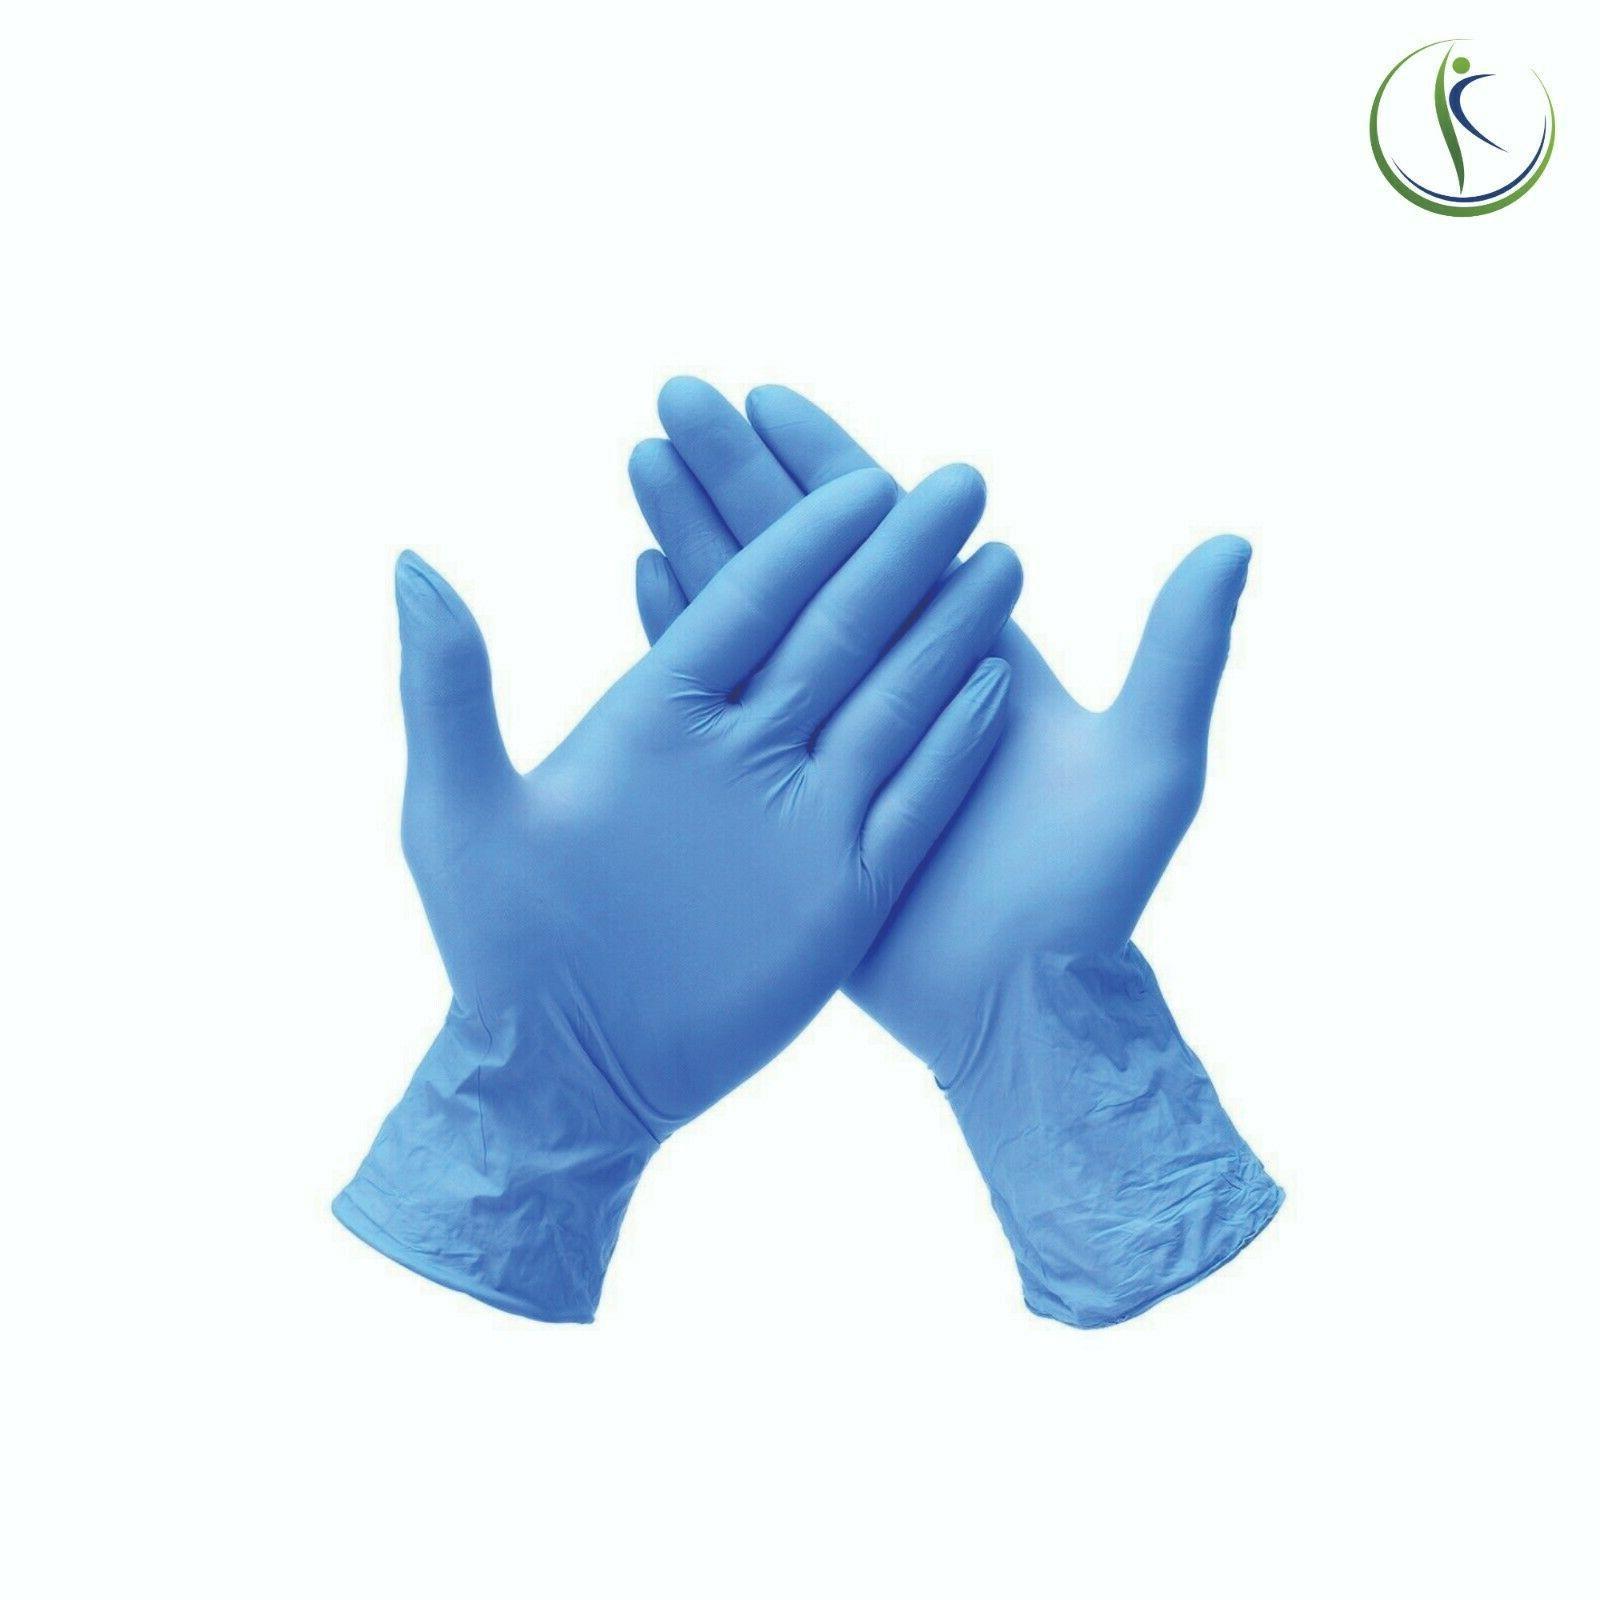 100 Nitrile Medical Examination Disposable Gloves Powder-Fre